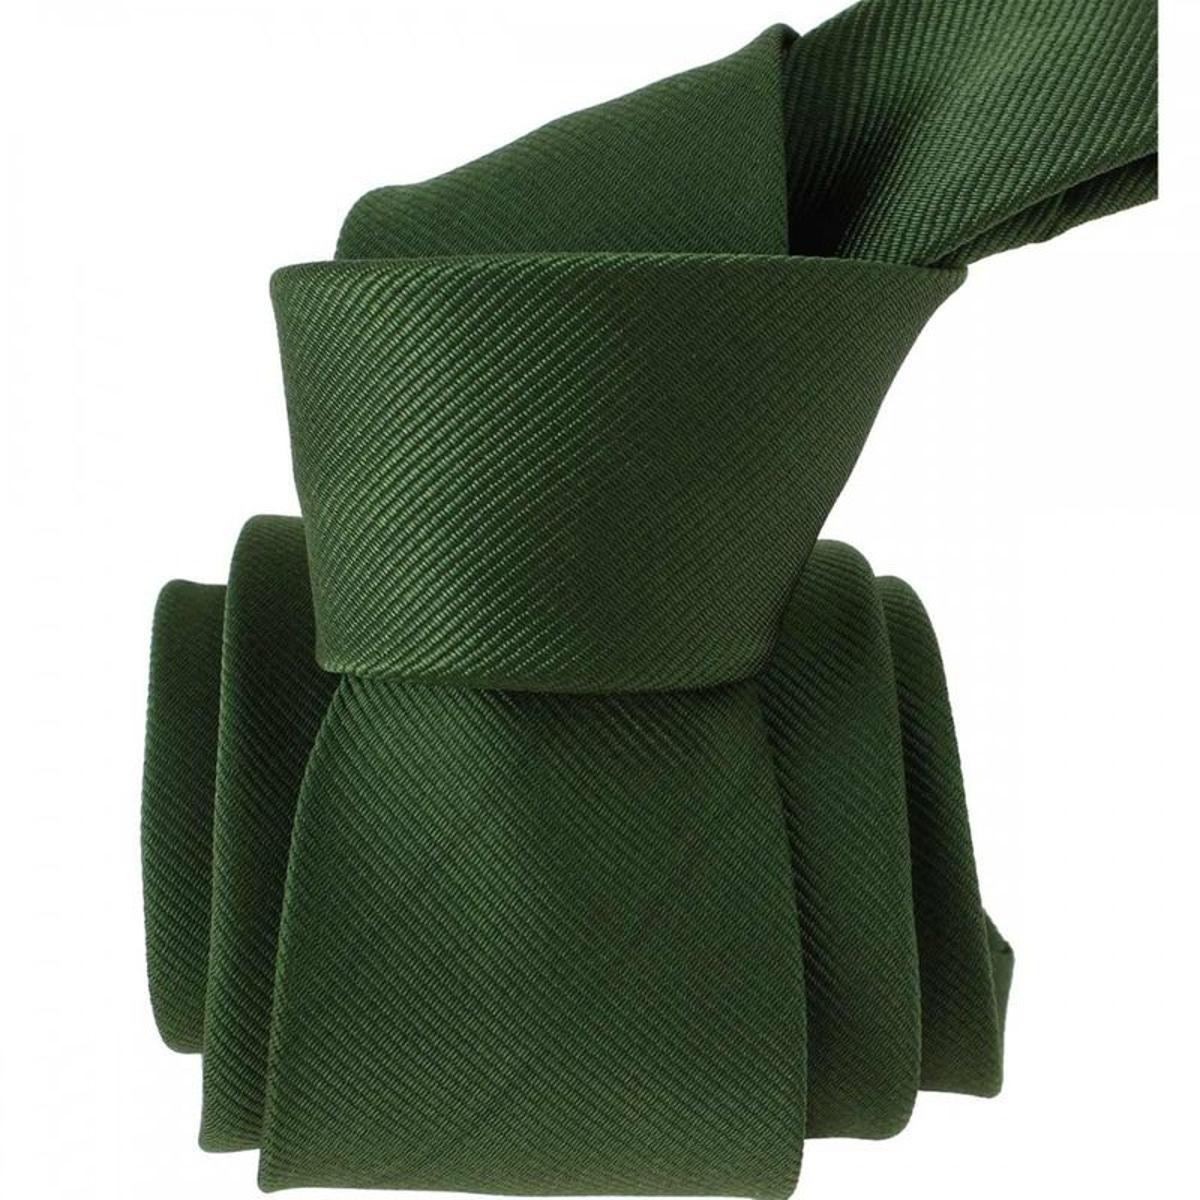 Cravate microfibre lisieux